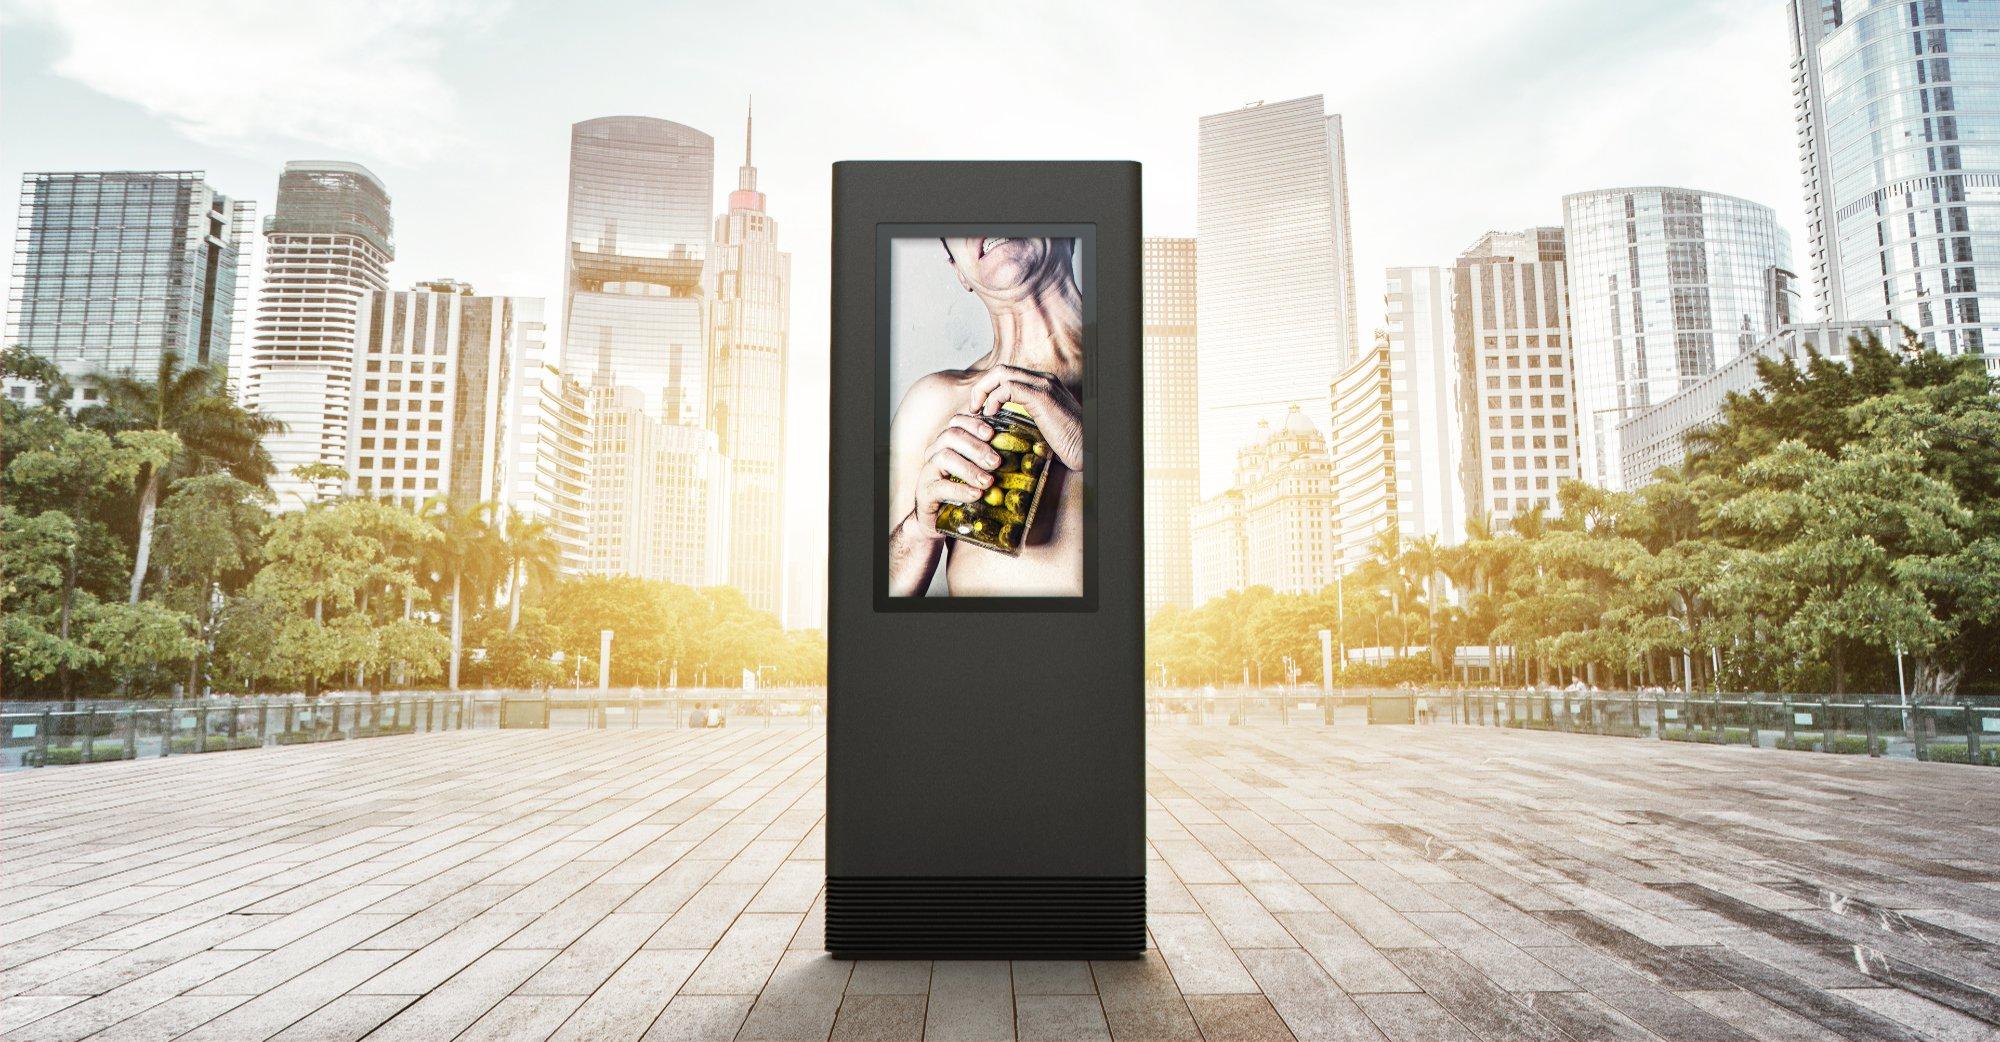 moobo-rhythm-outdoor-kiosk-big